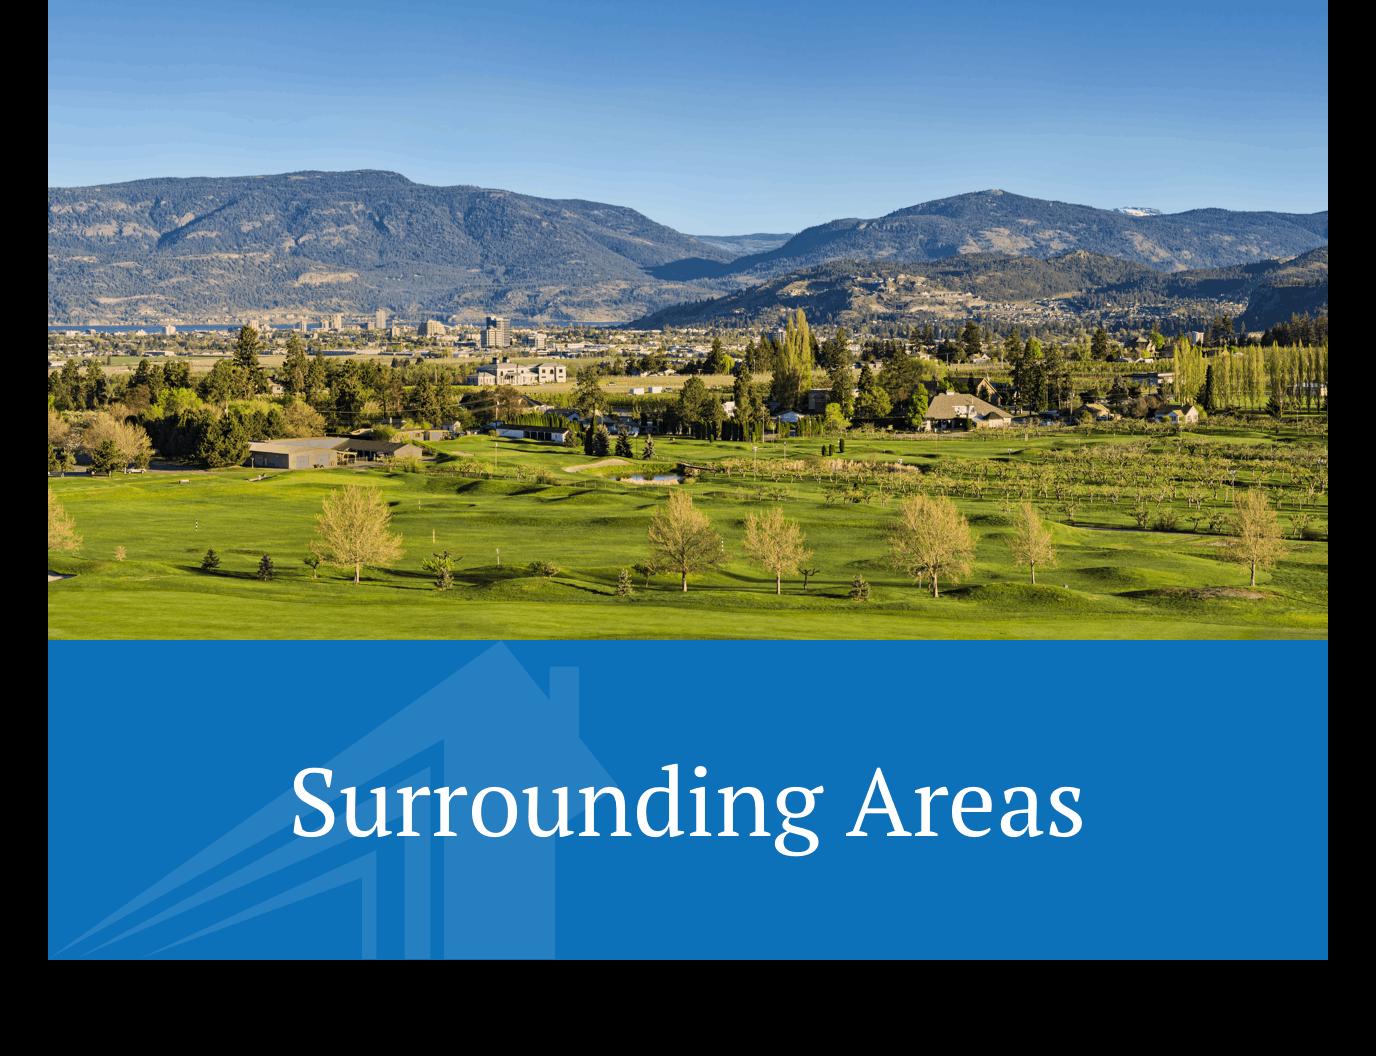 Surrounding Areas